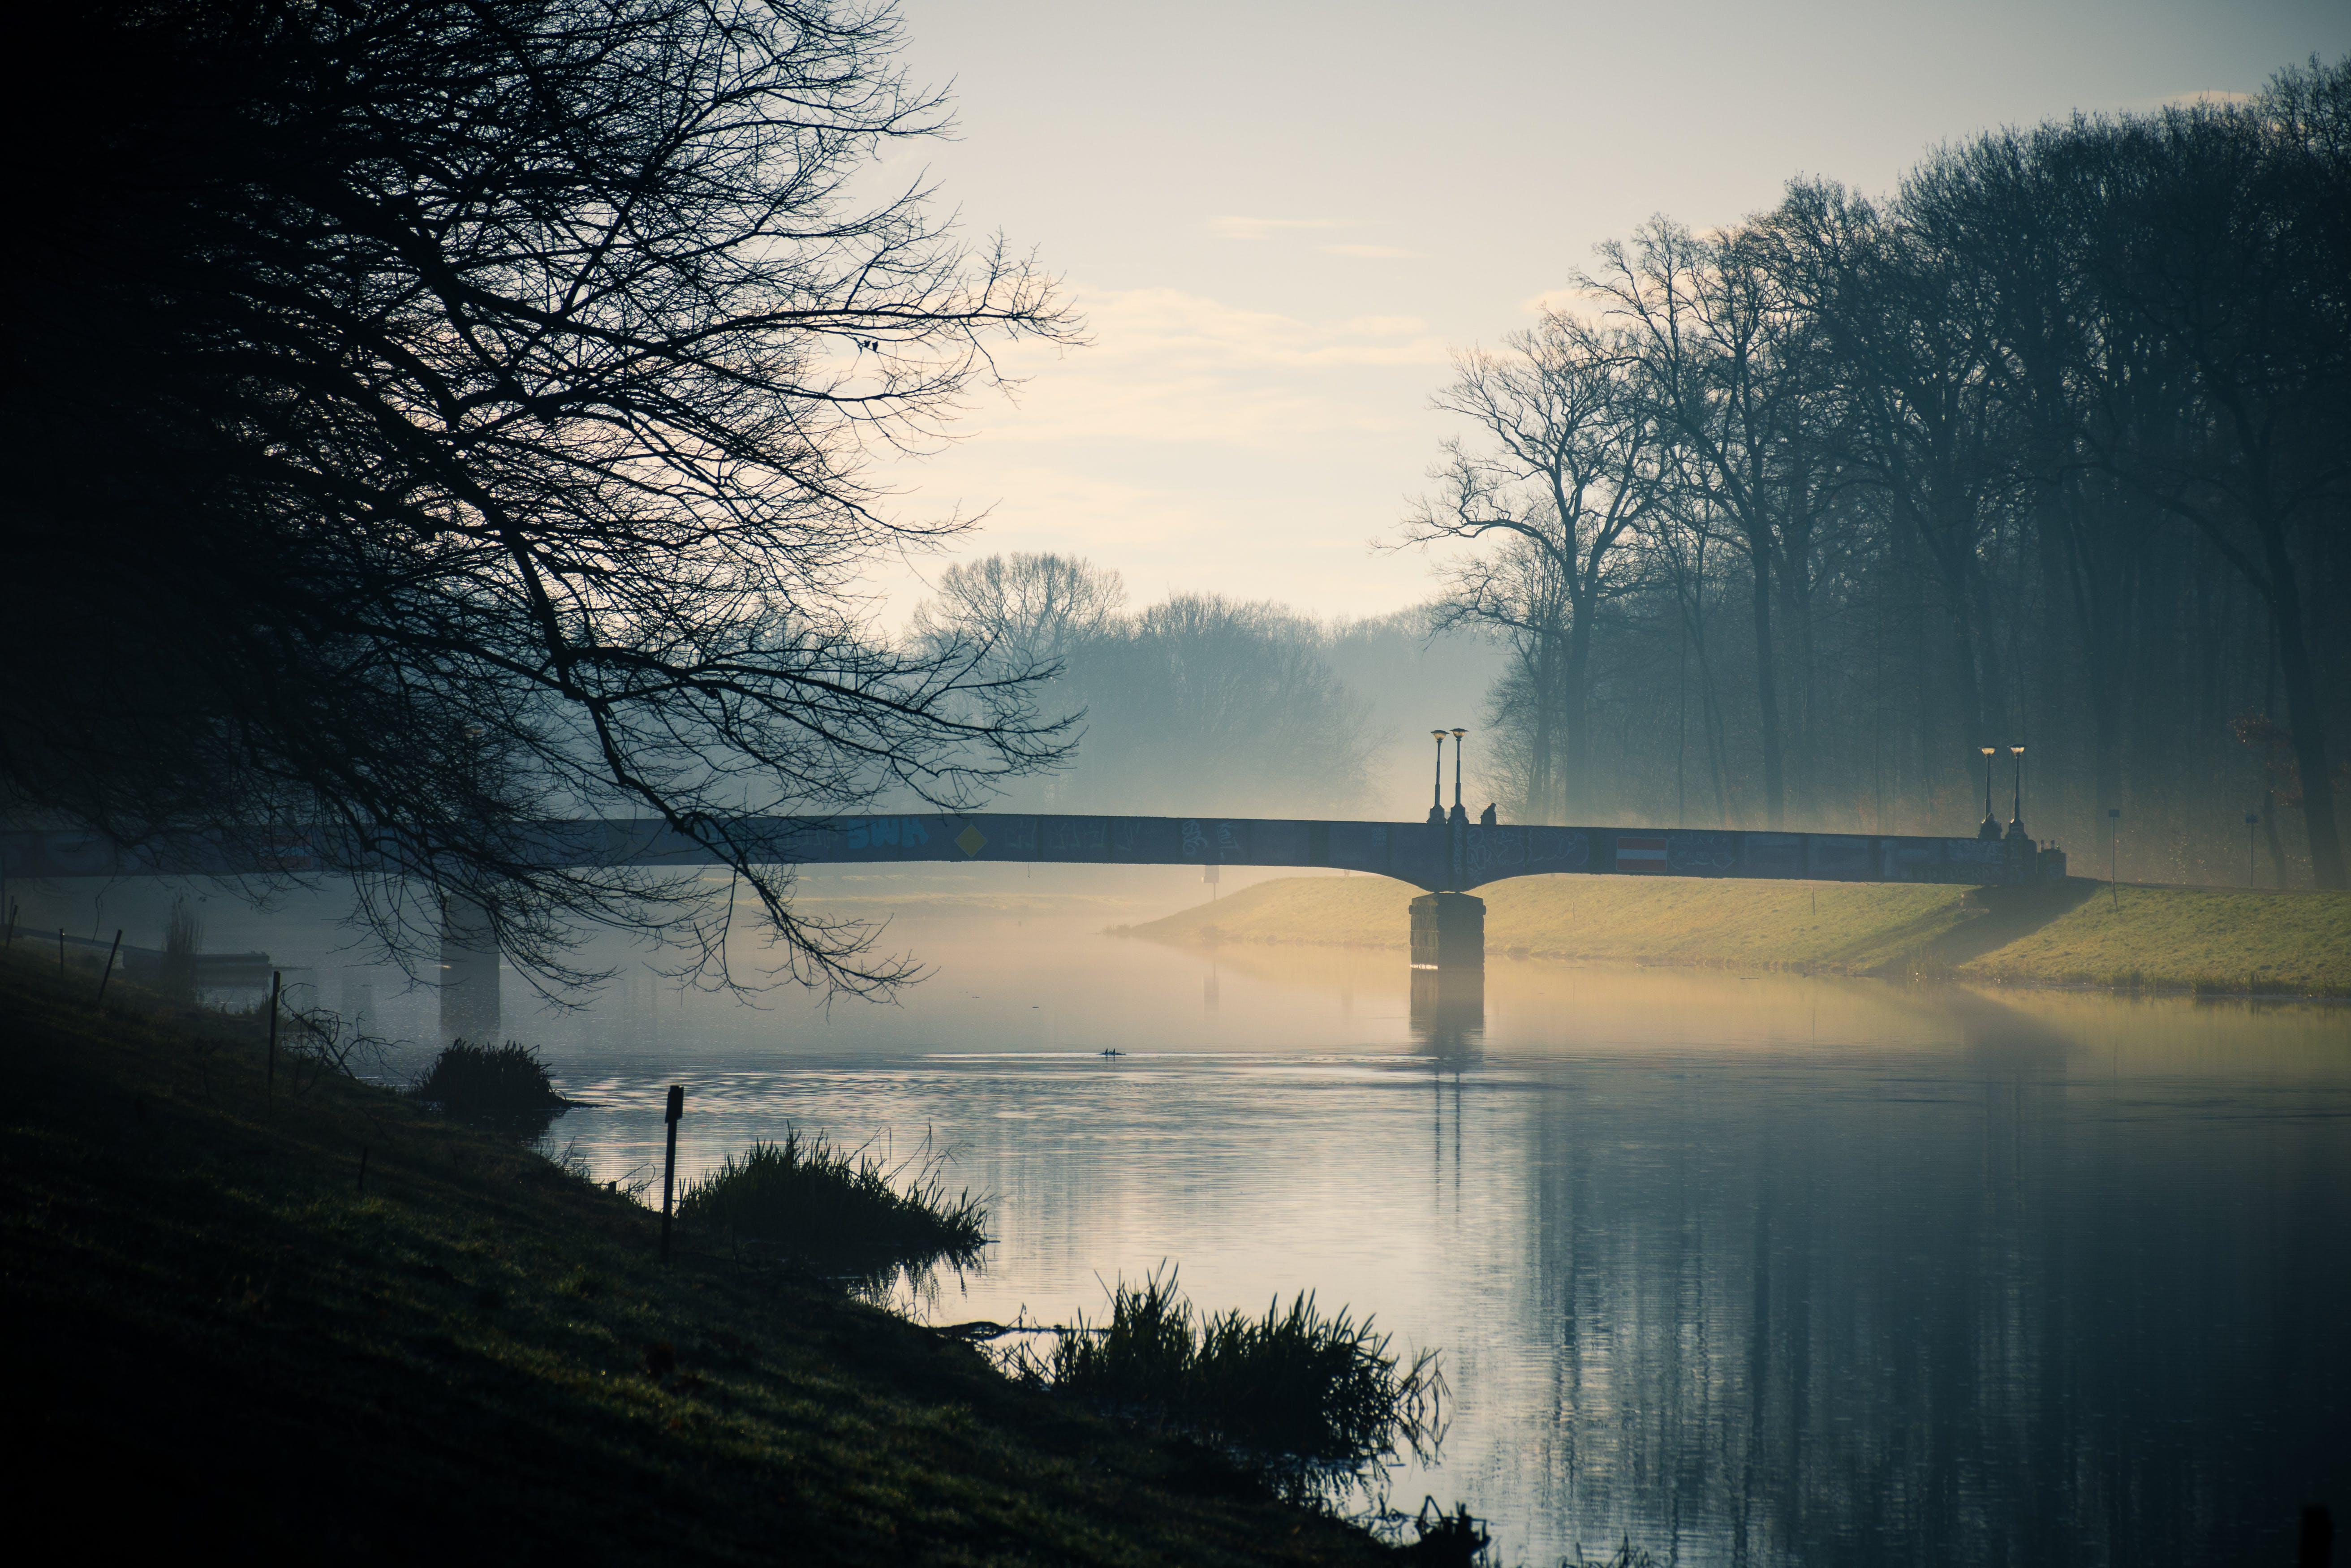 Gray Bridge Above River during Dusk